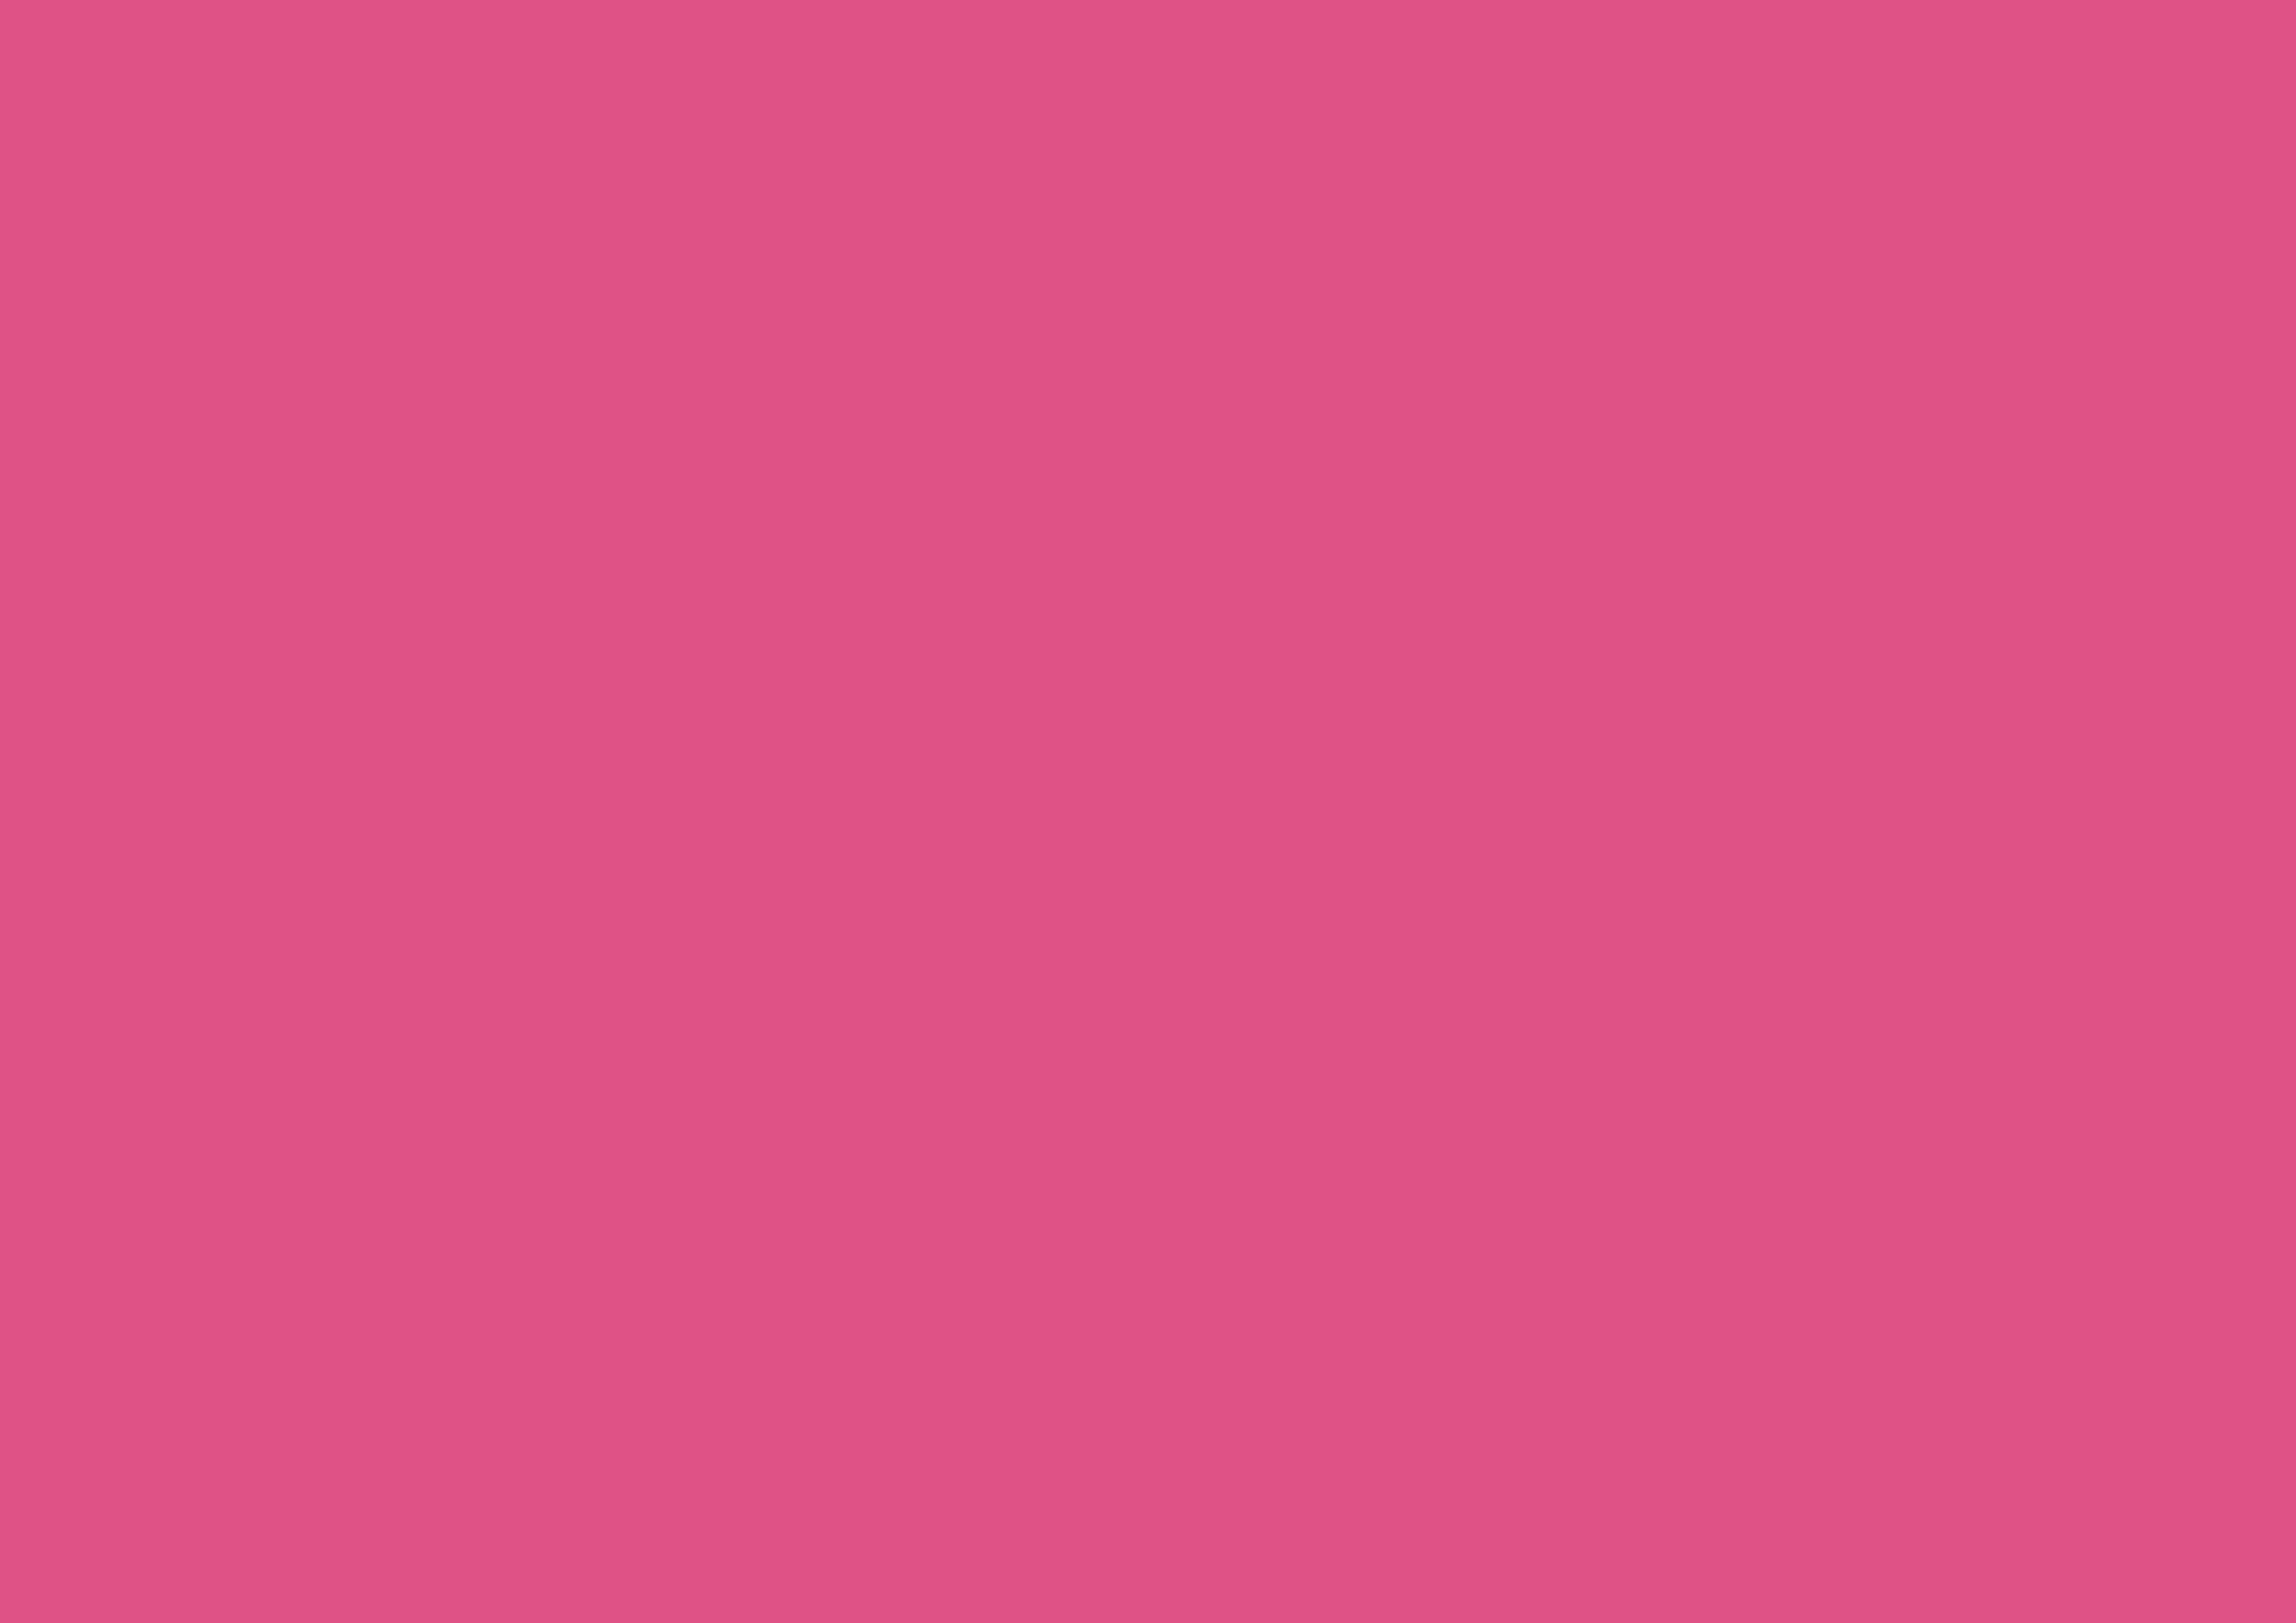 3508x2480 Fandango Pink Solid Color Background